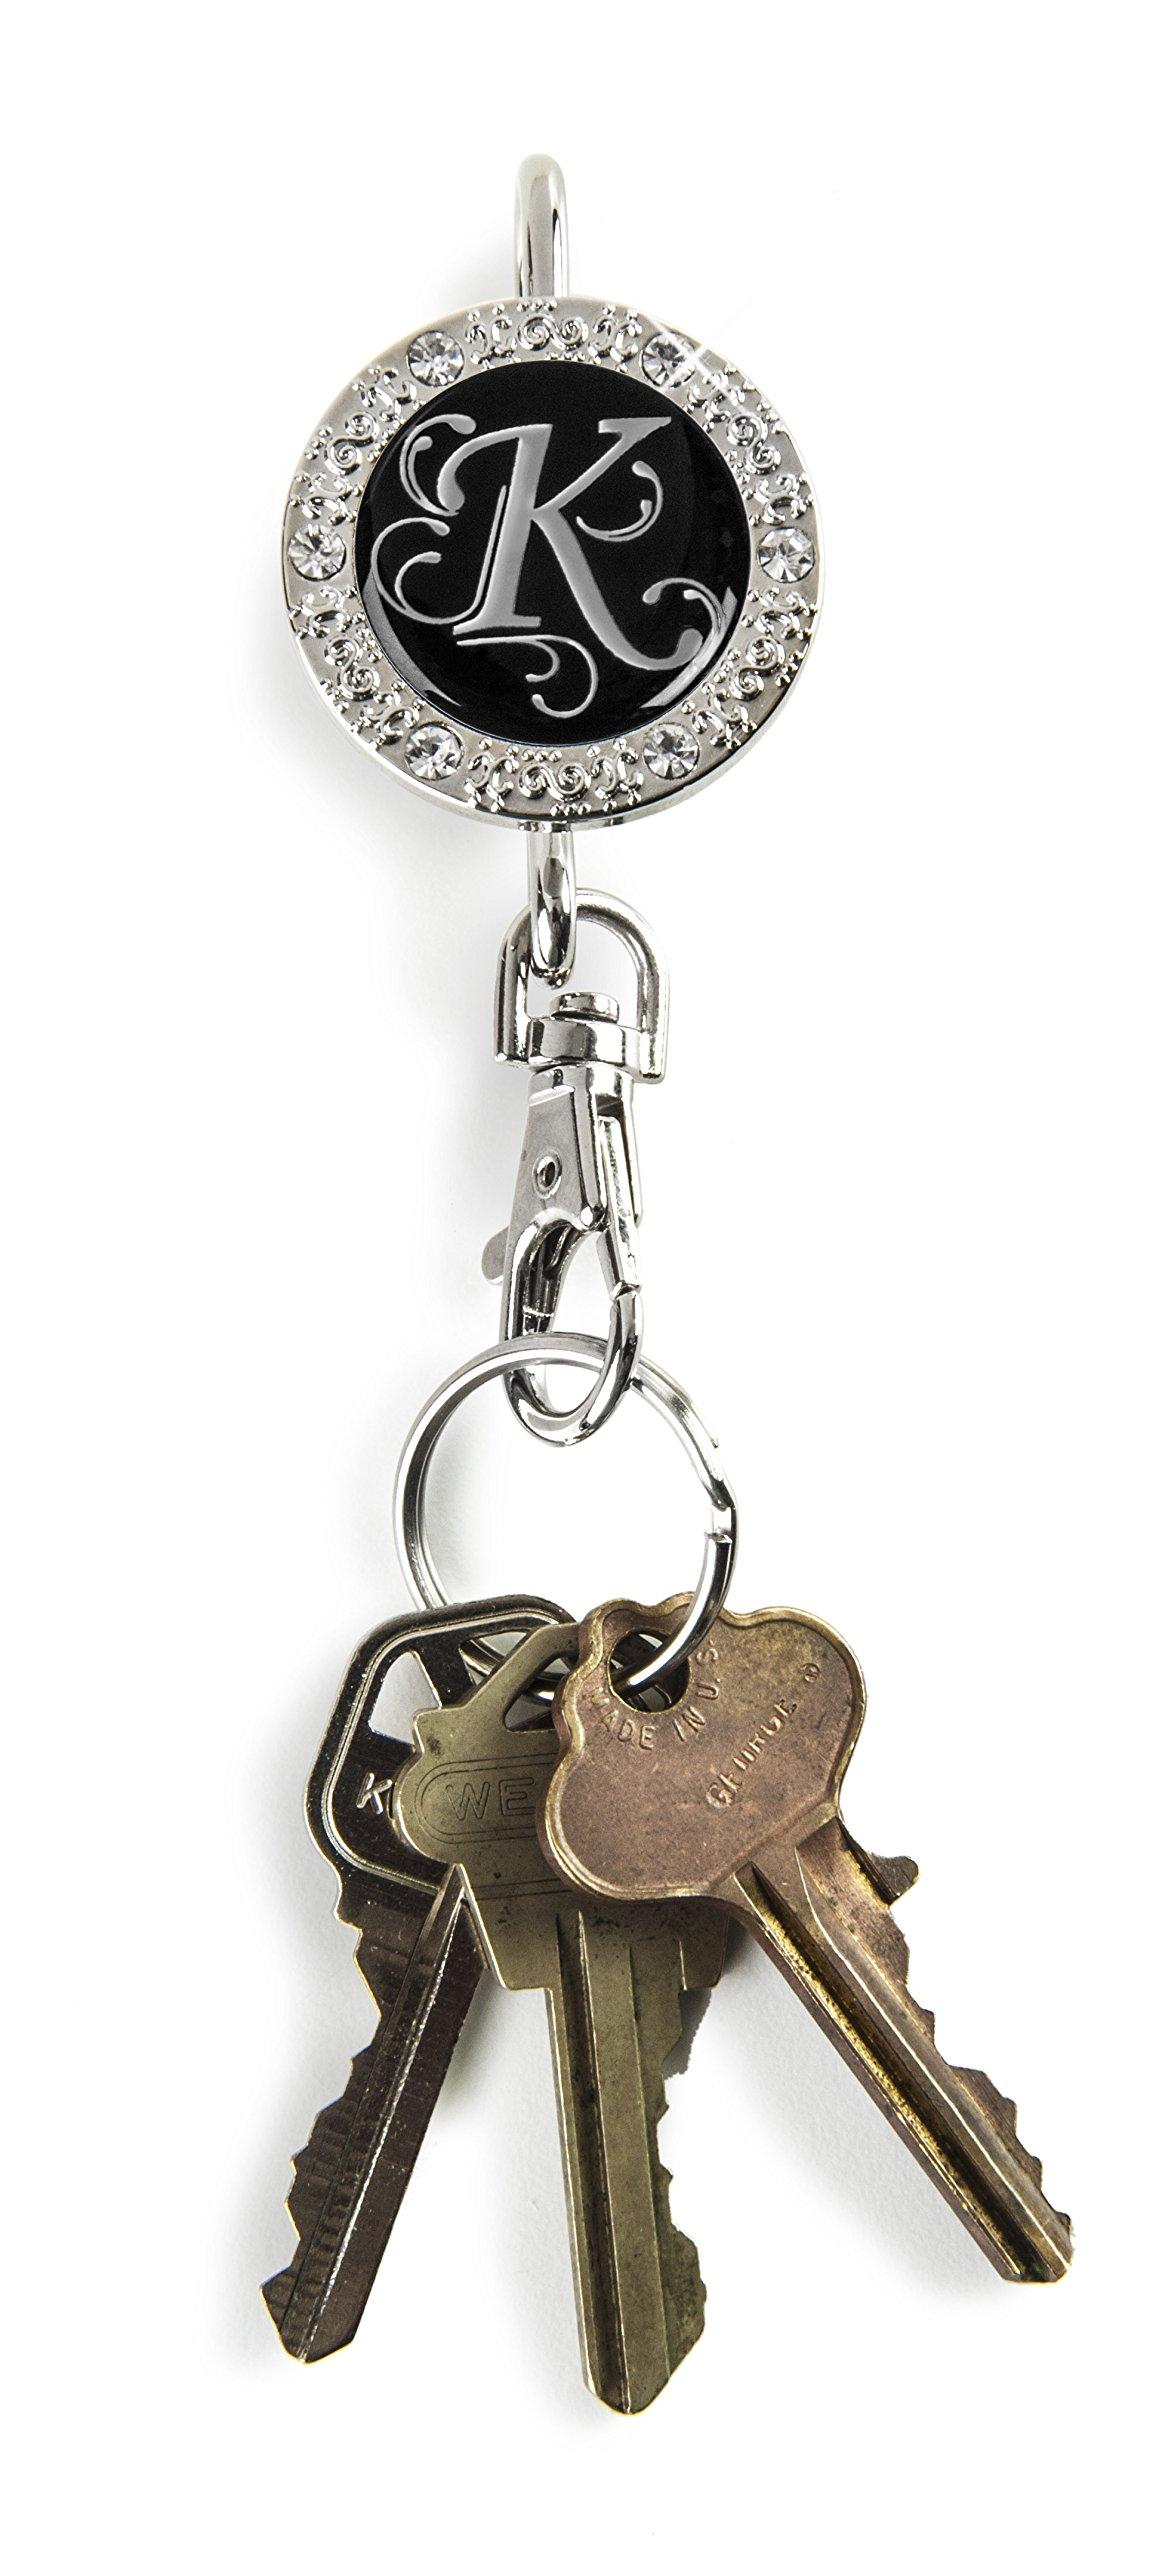 Alexx Finders Key Purse 01B-Mono K Bling Monogram K Finders Key Purse, Black